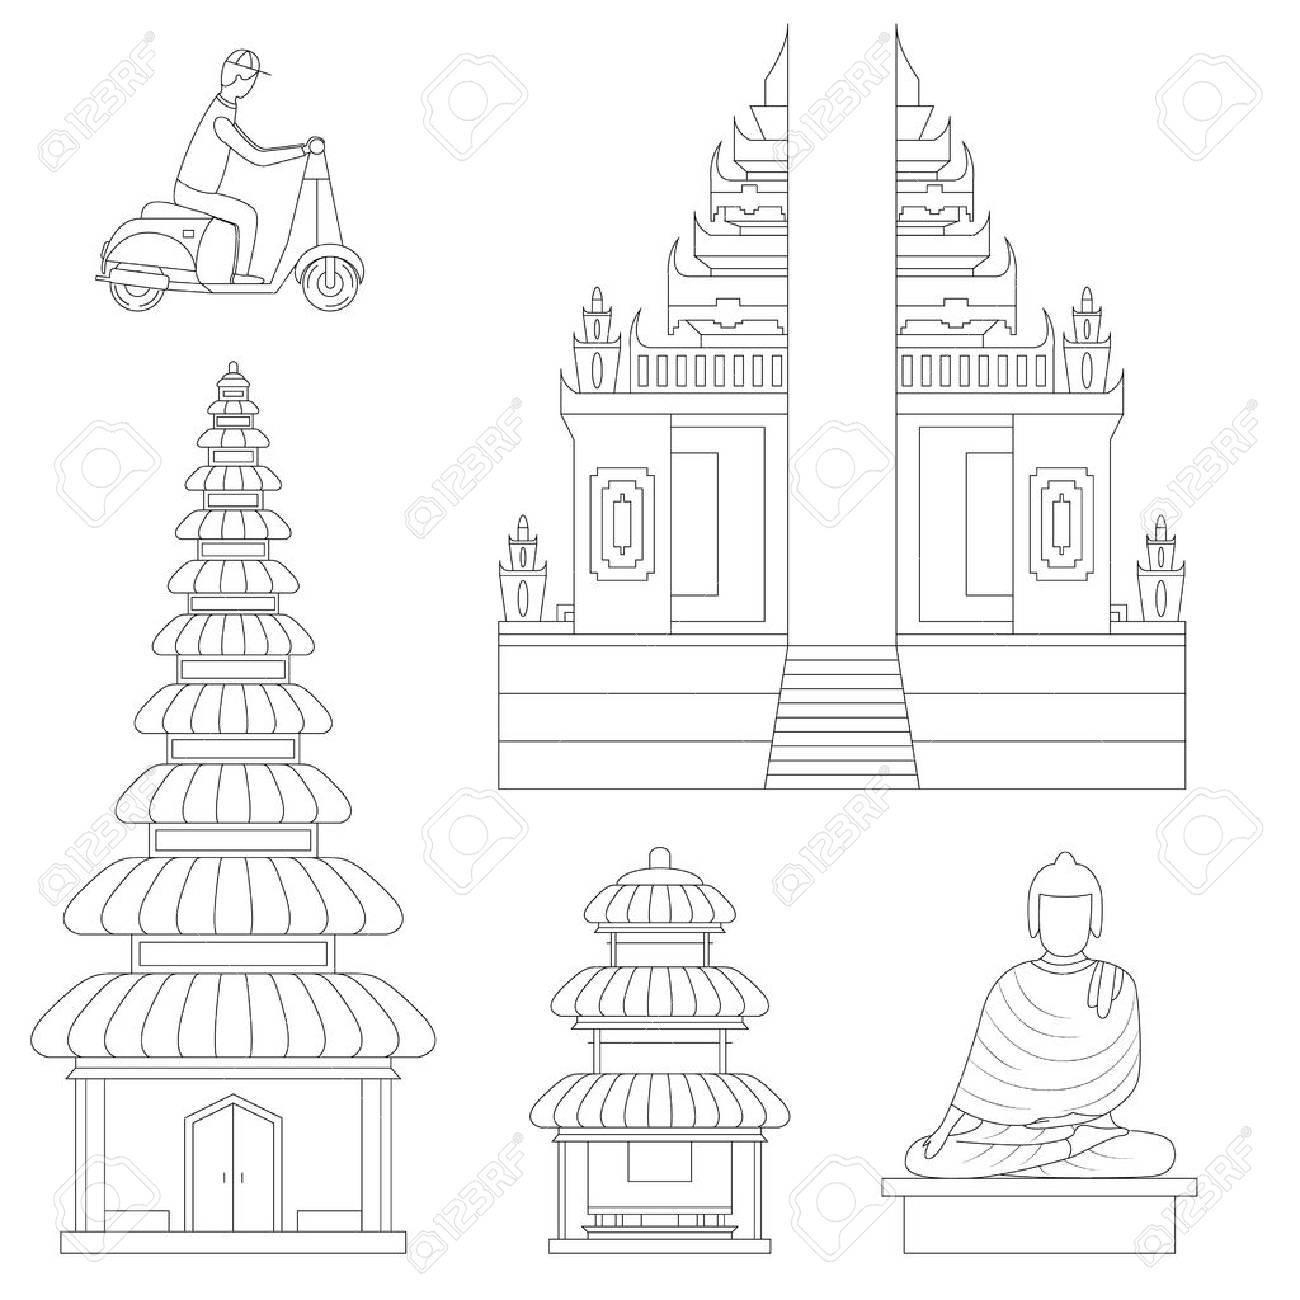 Bali Thin Line Art Building Pixel Perfect Art. Material Design. Vector illustration - 64155378